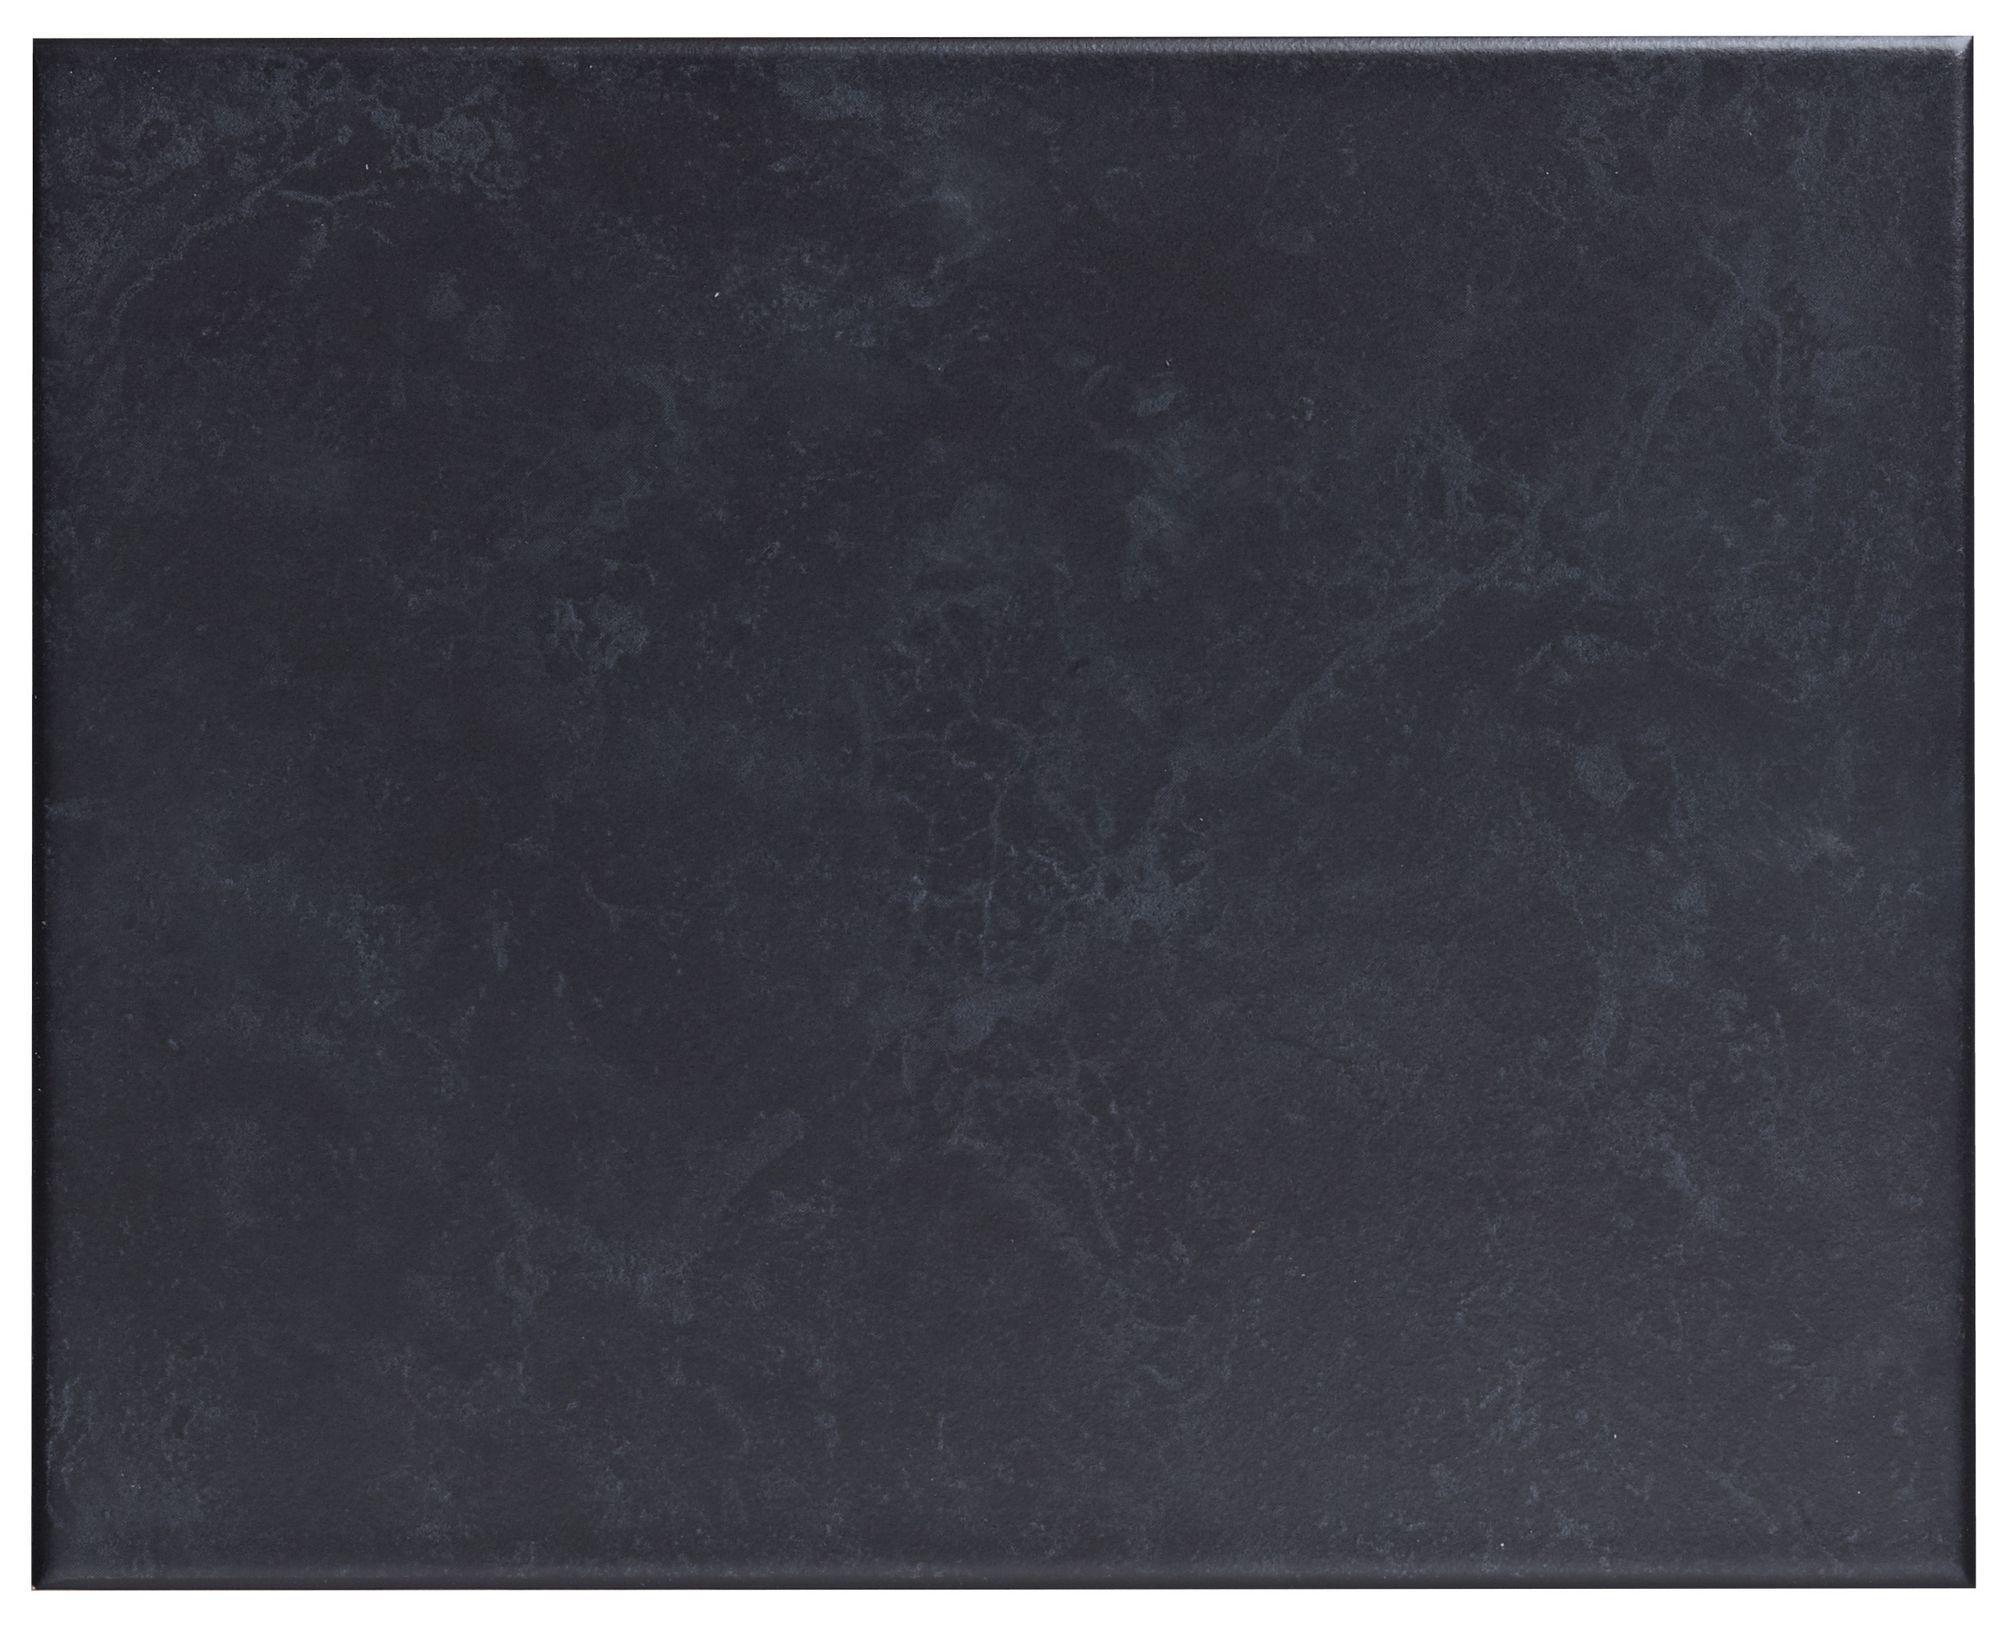 Helena Black Ceramic Wall Tile, Pack Of 20, (l)250mm (w)200mm